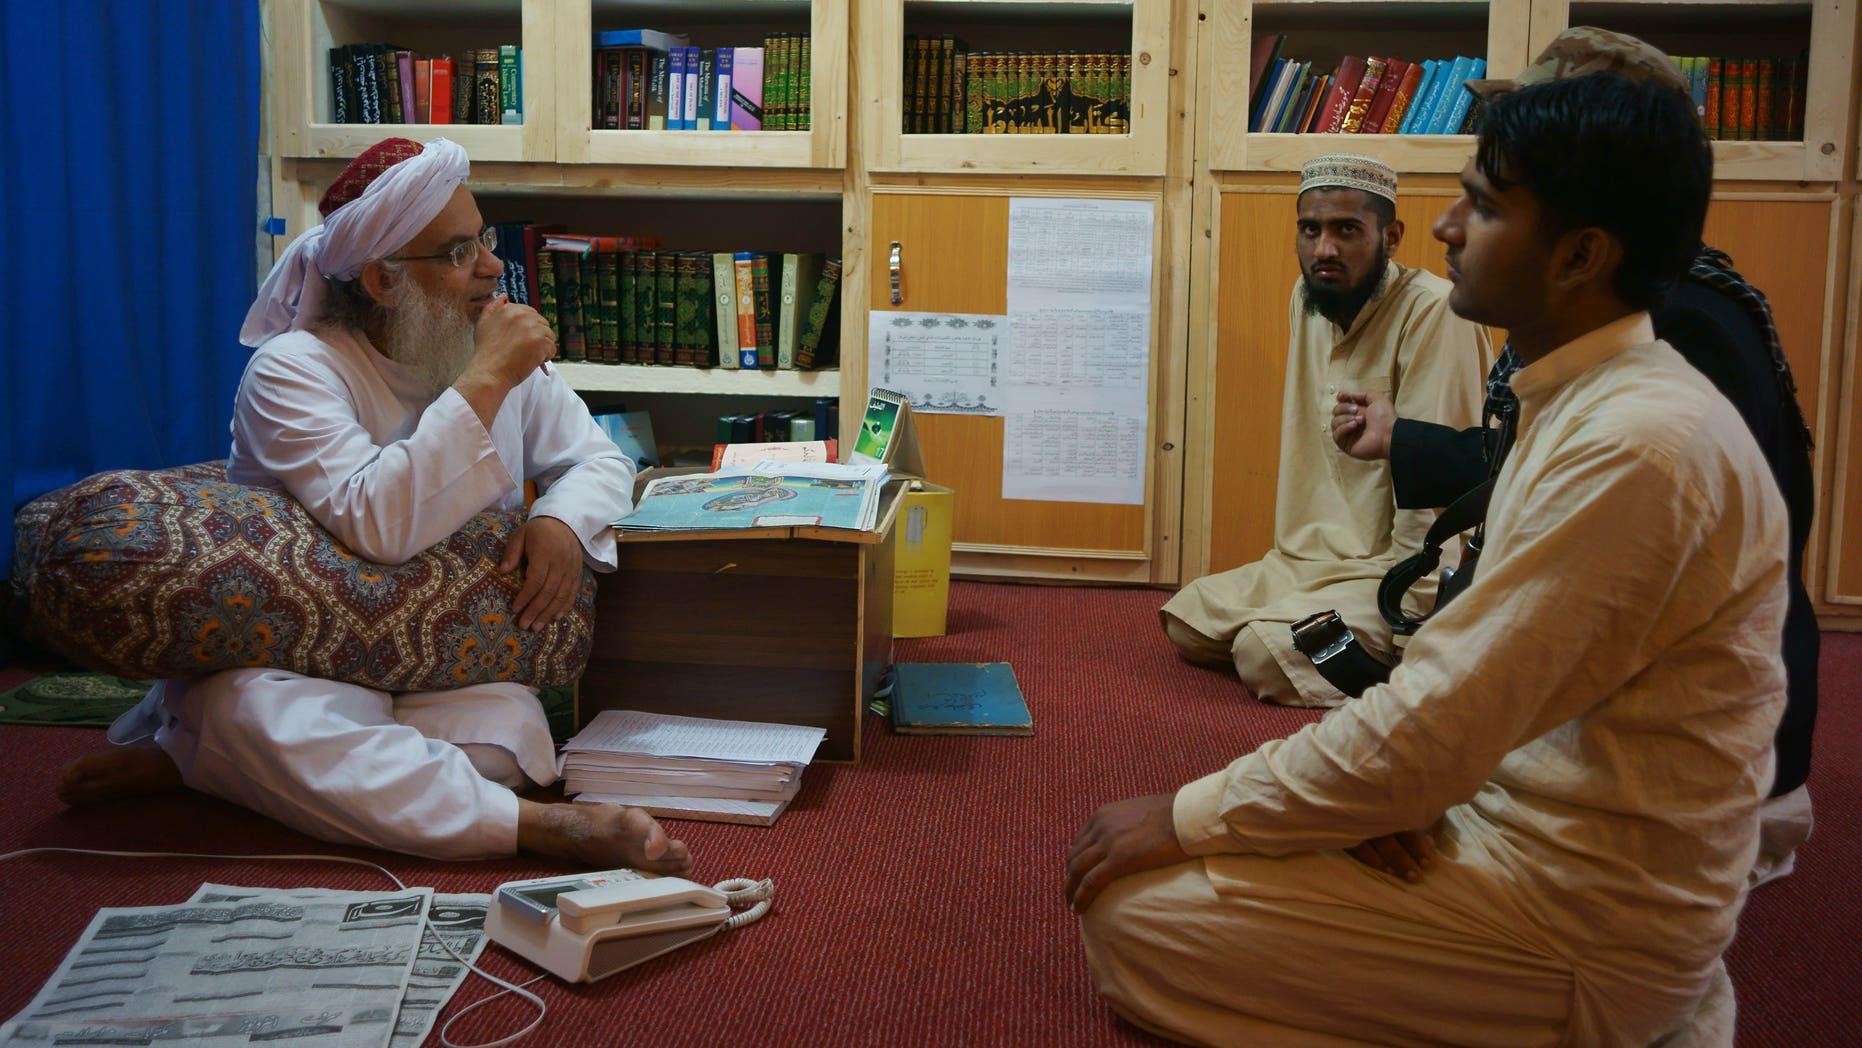 April 18, 2014 - Maulana Abdul Aziz, left, head cleric of a Pakistani seminary, in a library named after slain al Qaeda leader Usama bin Laden in Islamabad, Pakistan.